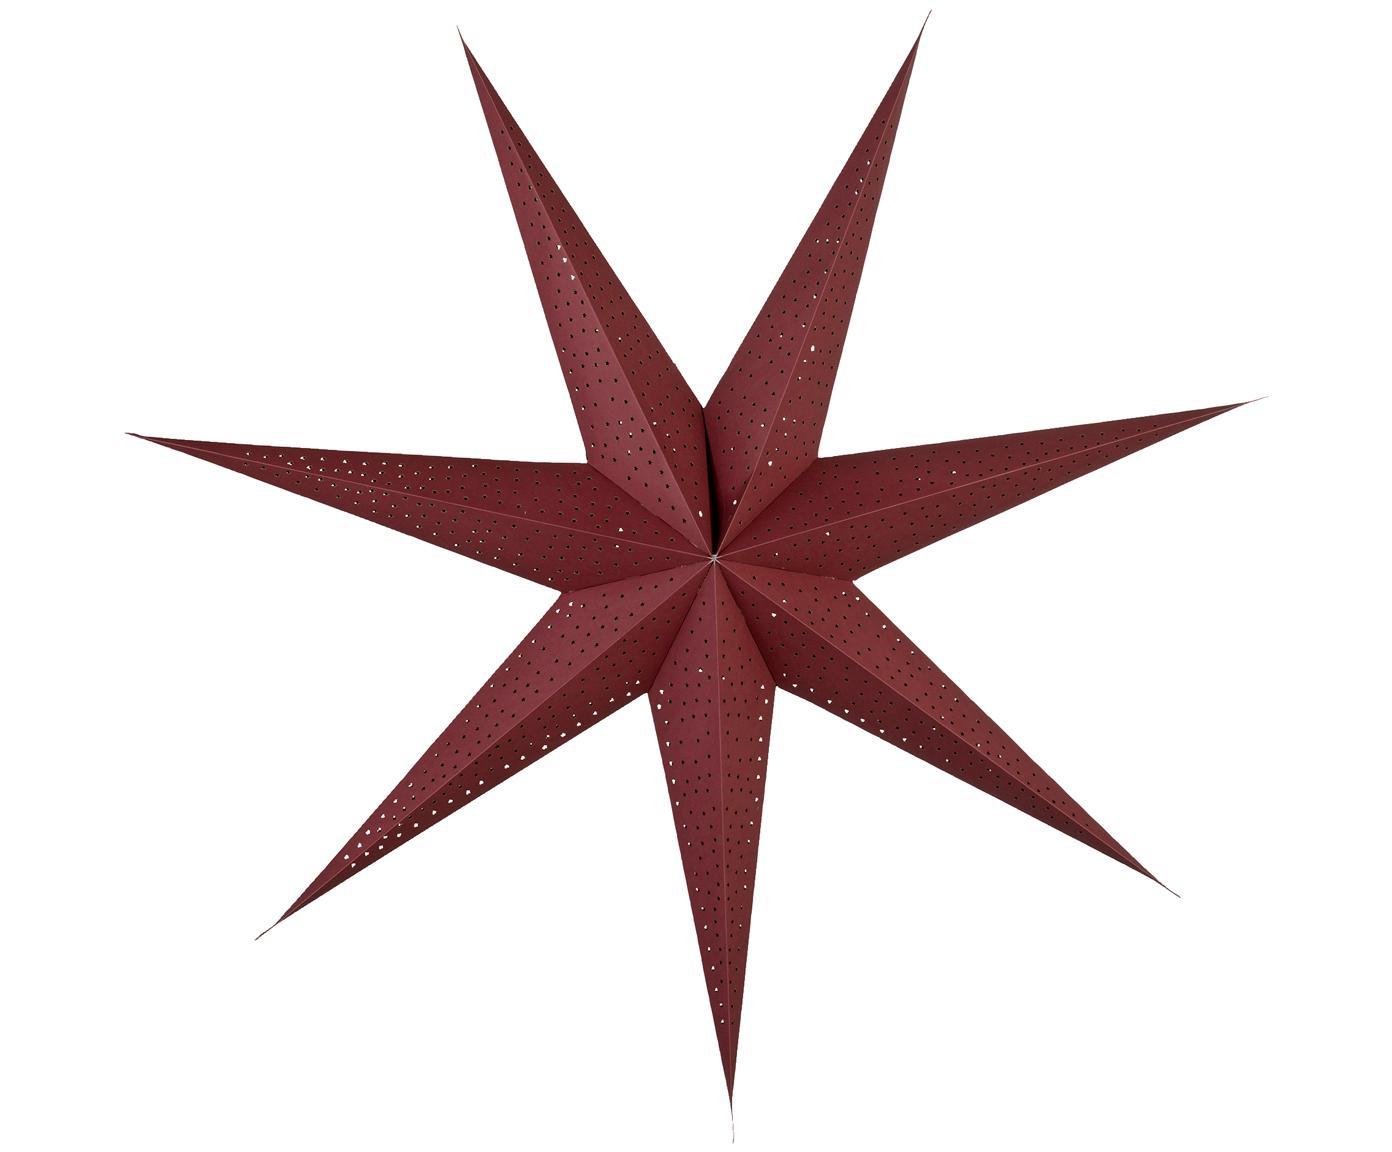 Papierstern Icilinia, Papier, Granatapfelrot, Ø 80 cm